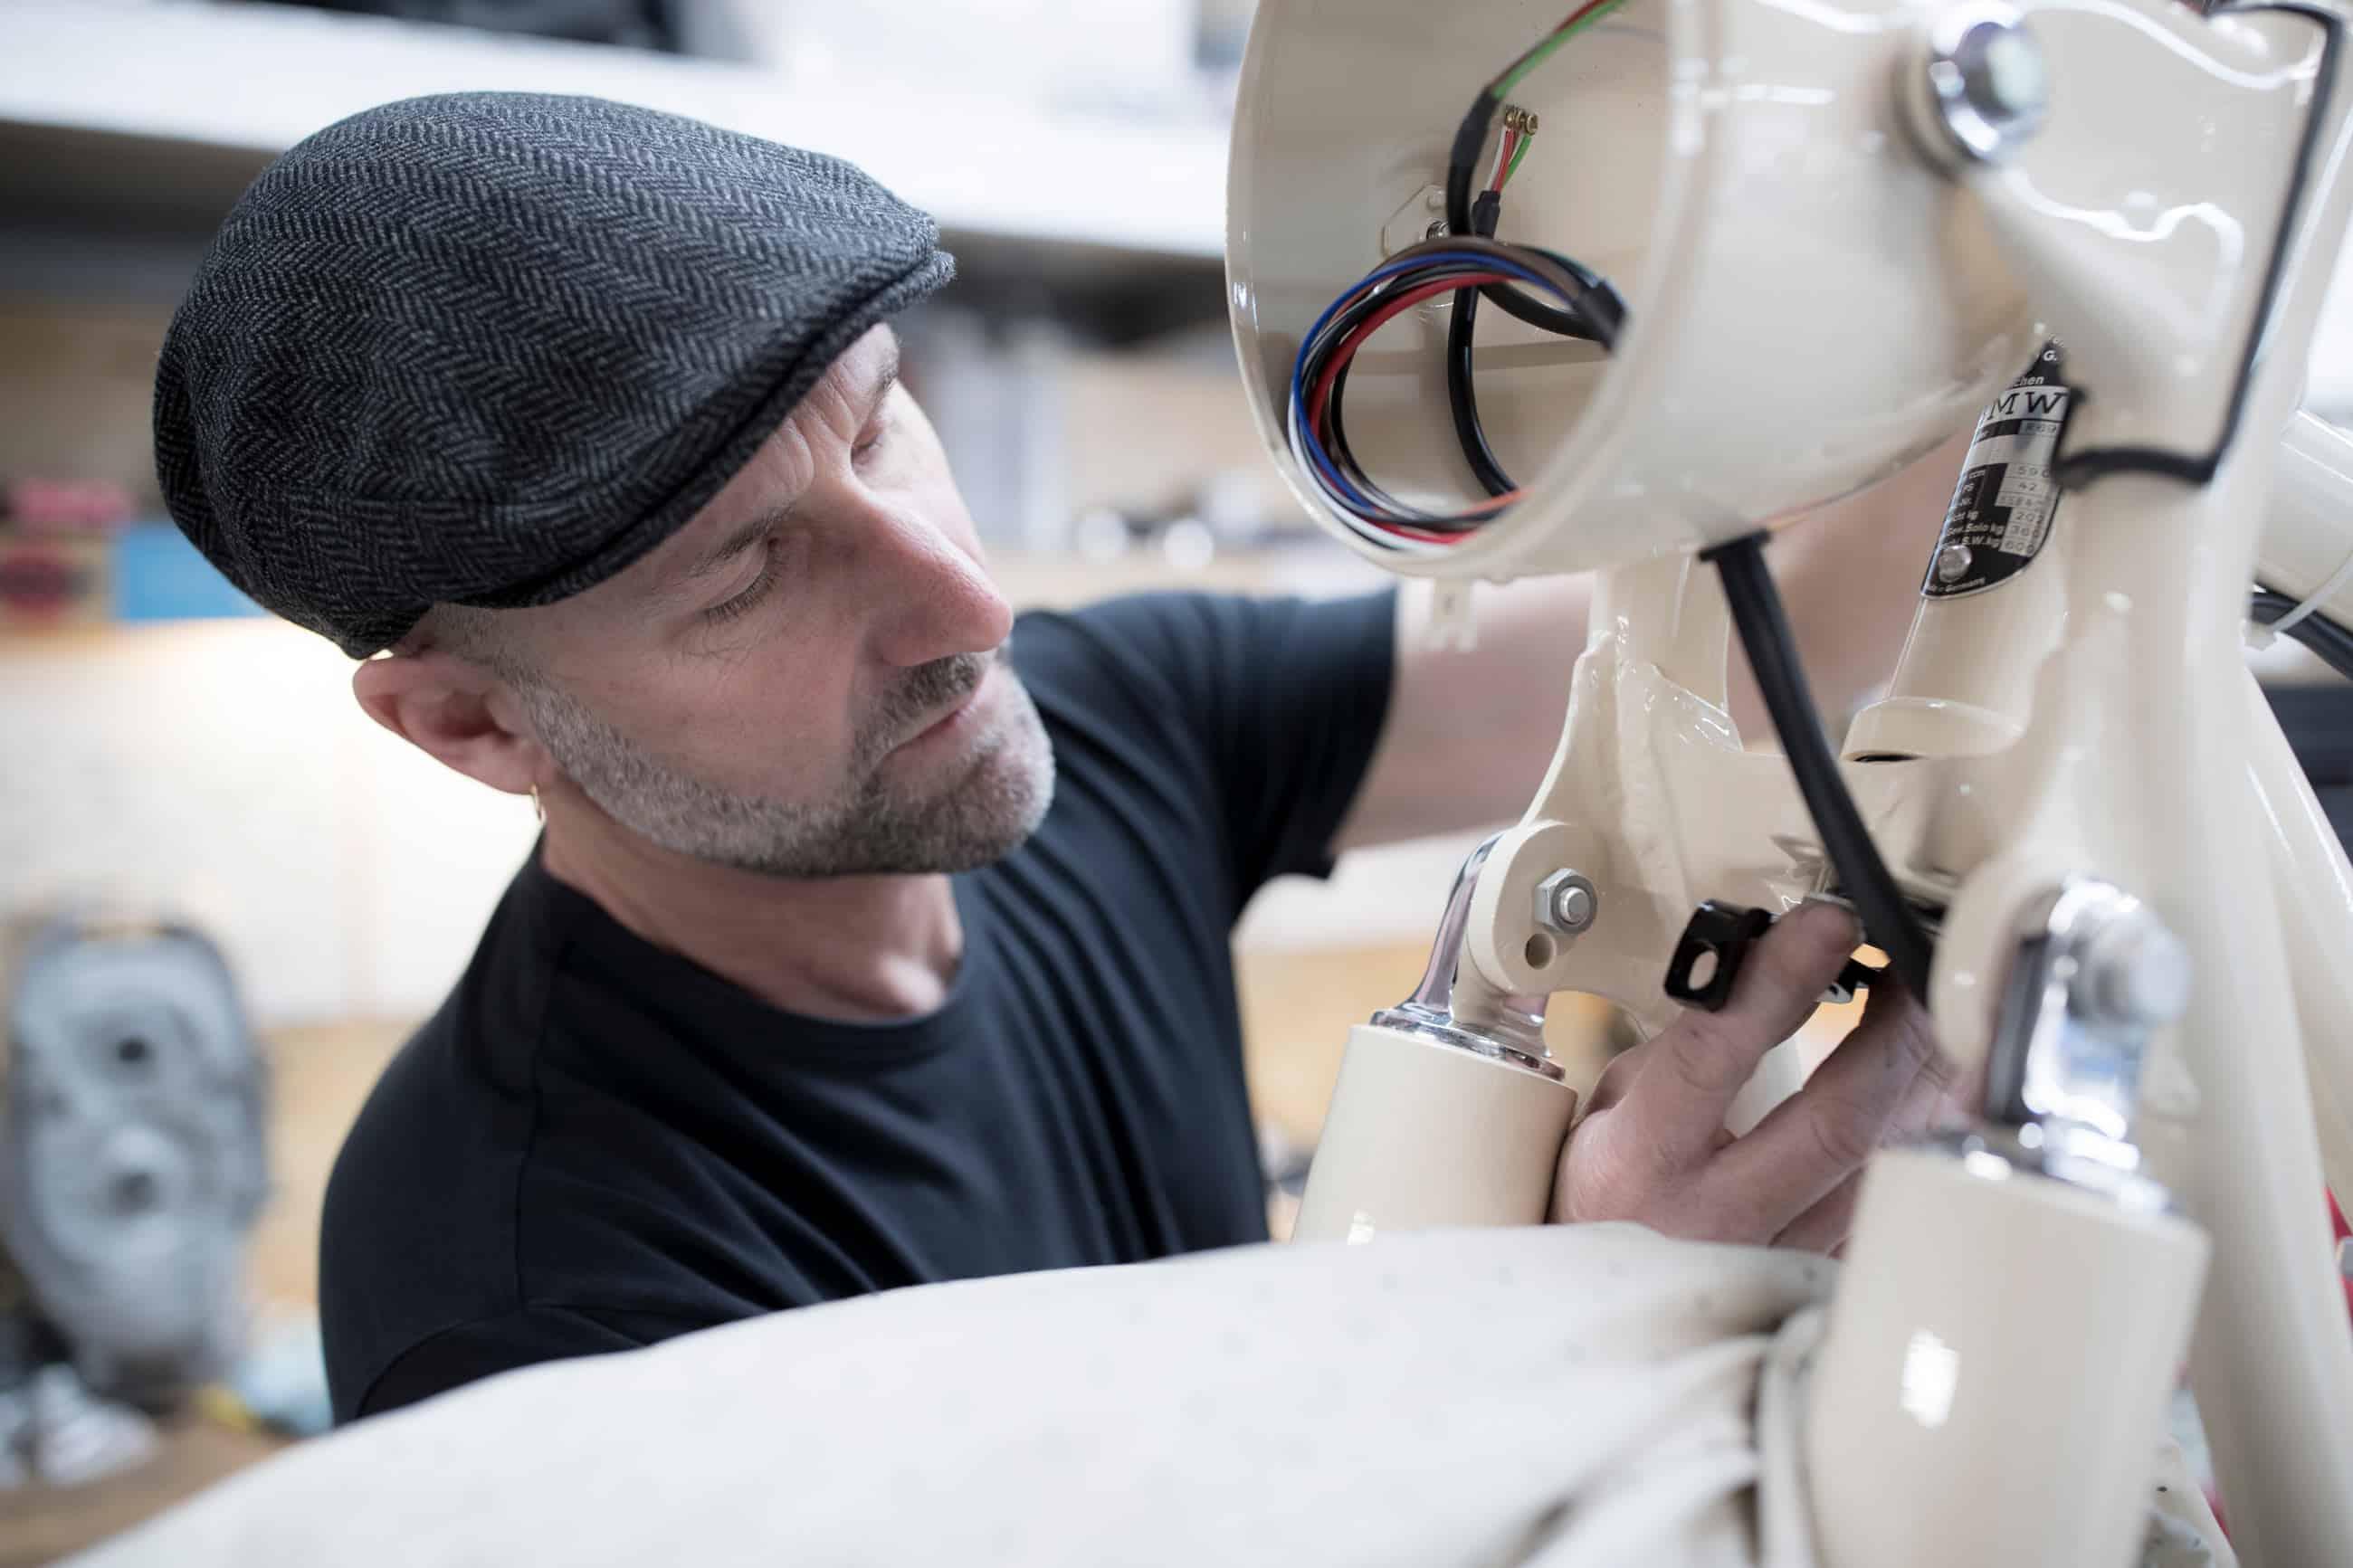 Tim Stafford, of Stafford Restorations, works on an R69S